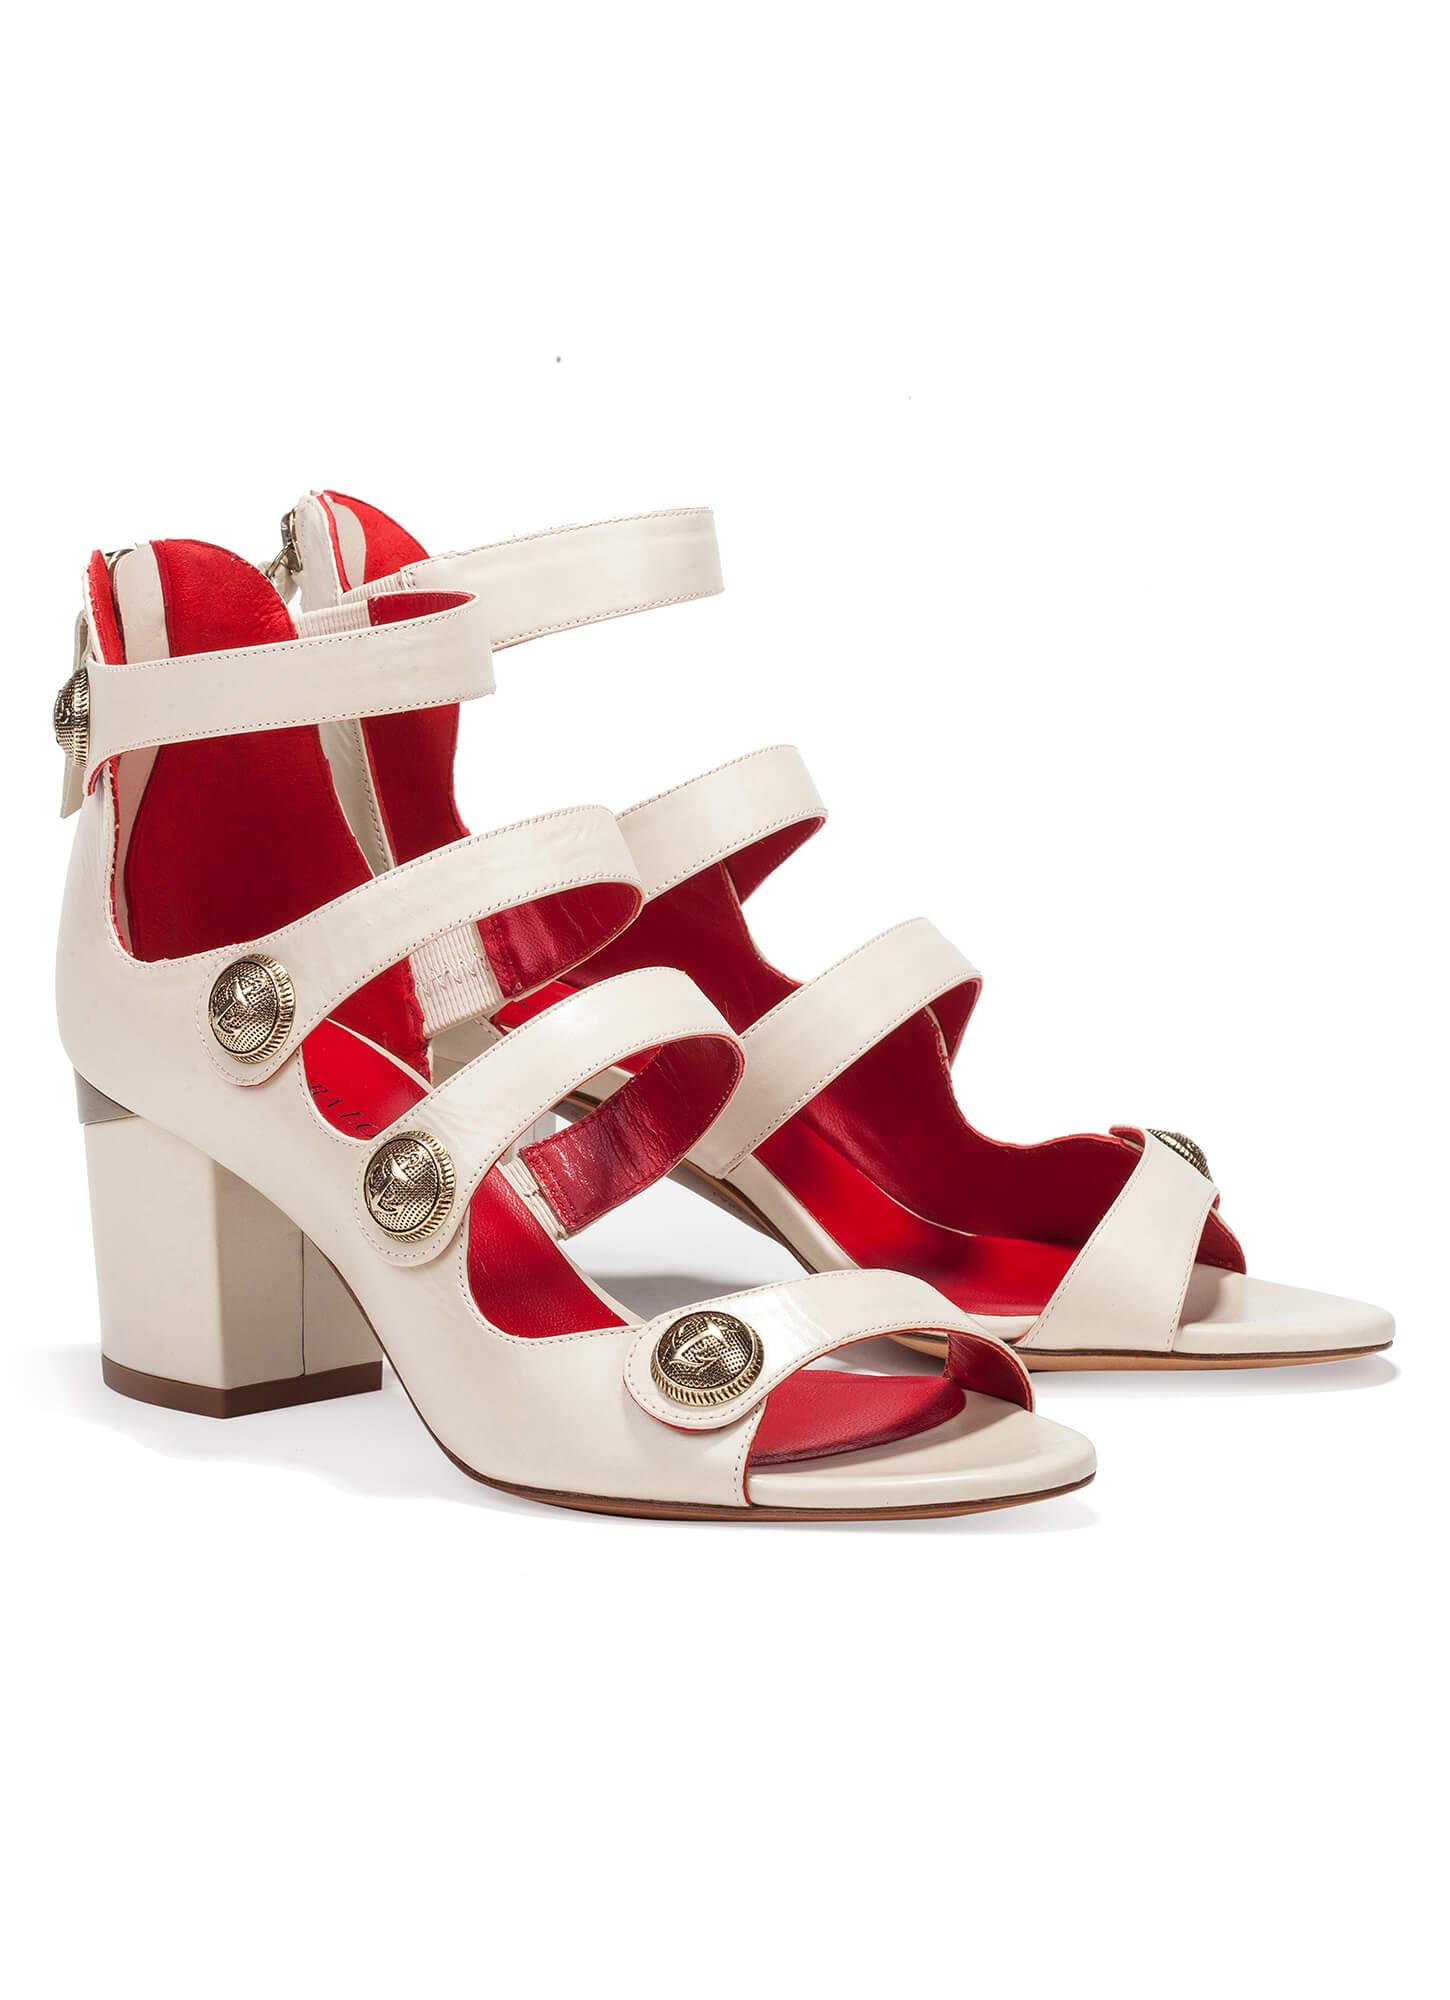 6509ff635548 Mid heel sandals with metal buttons - online shoe store Pura Lopez · Kimber Pura  López